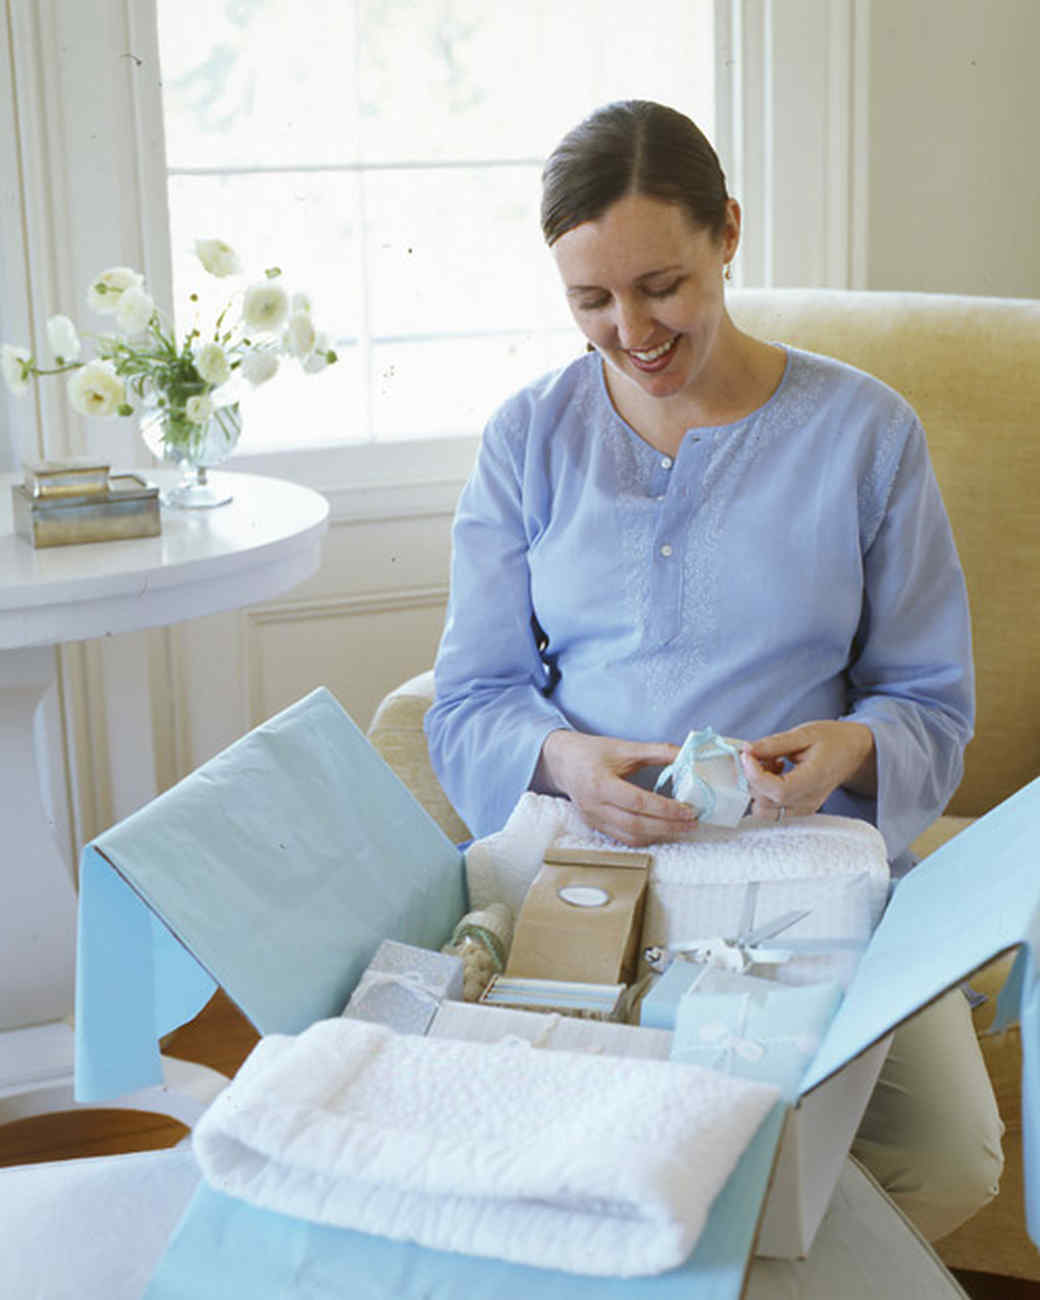 Baby Shower Gifts Mail ~ Baby shower by mail martha stewart